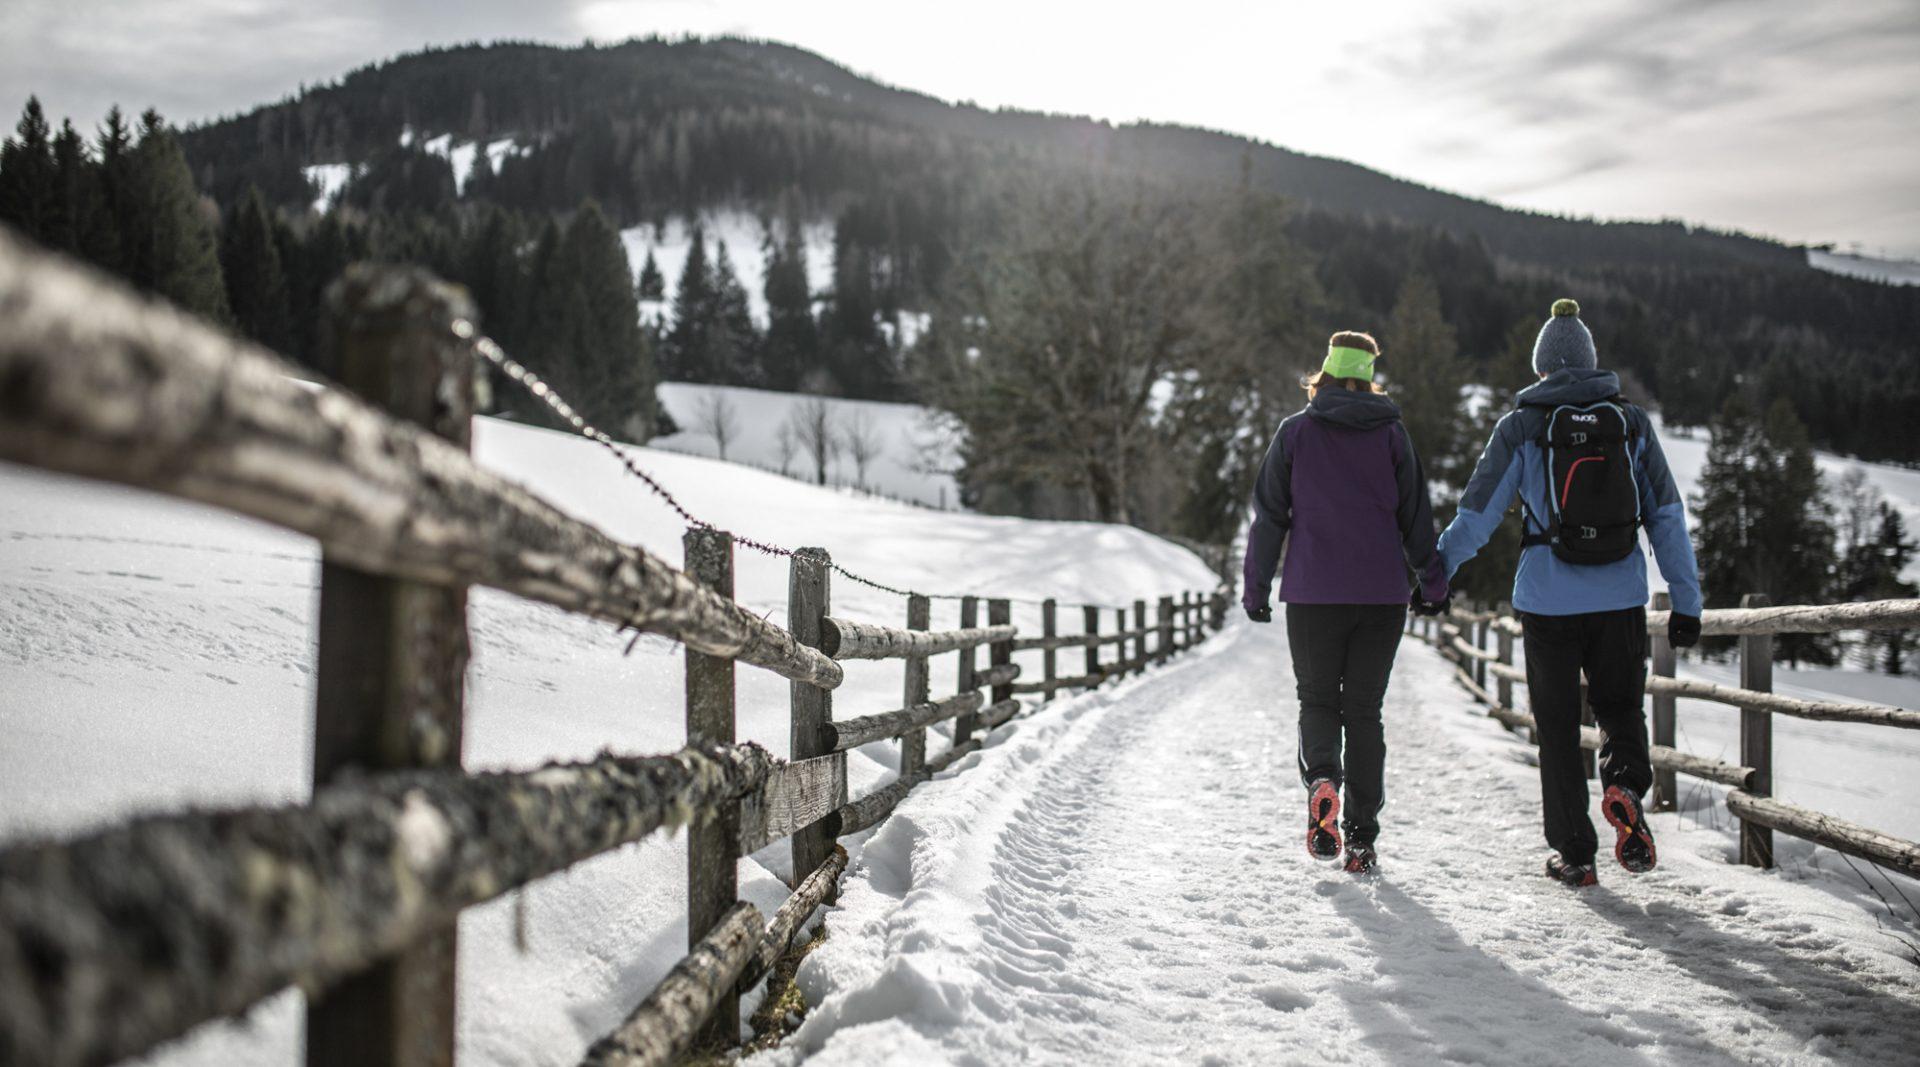 saalfelden-leogang-winter-winterwandern-c-artisual